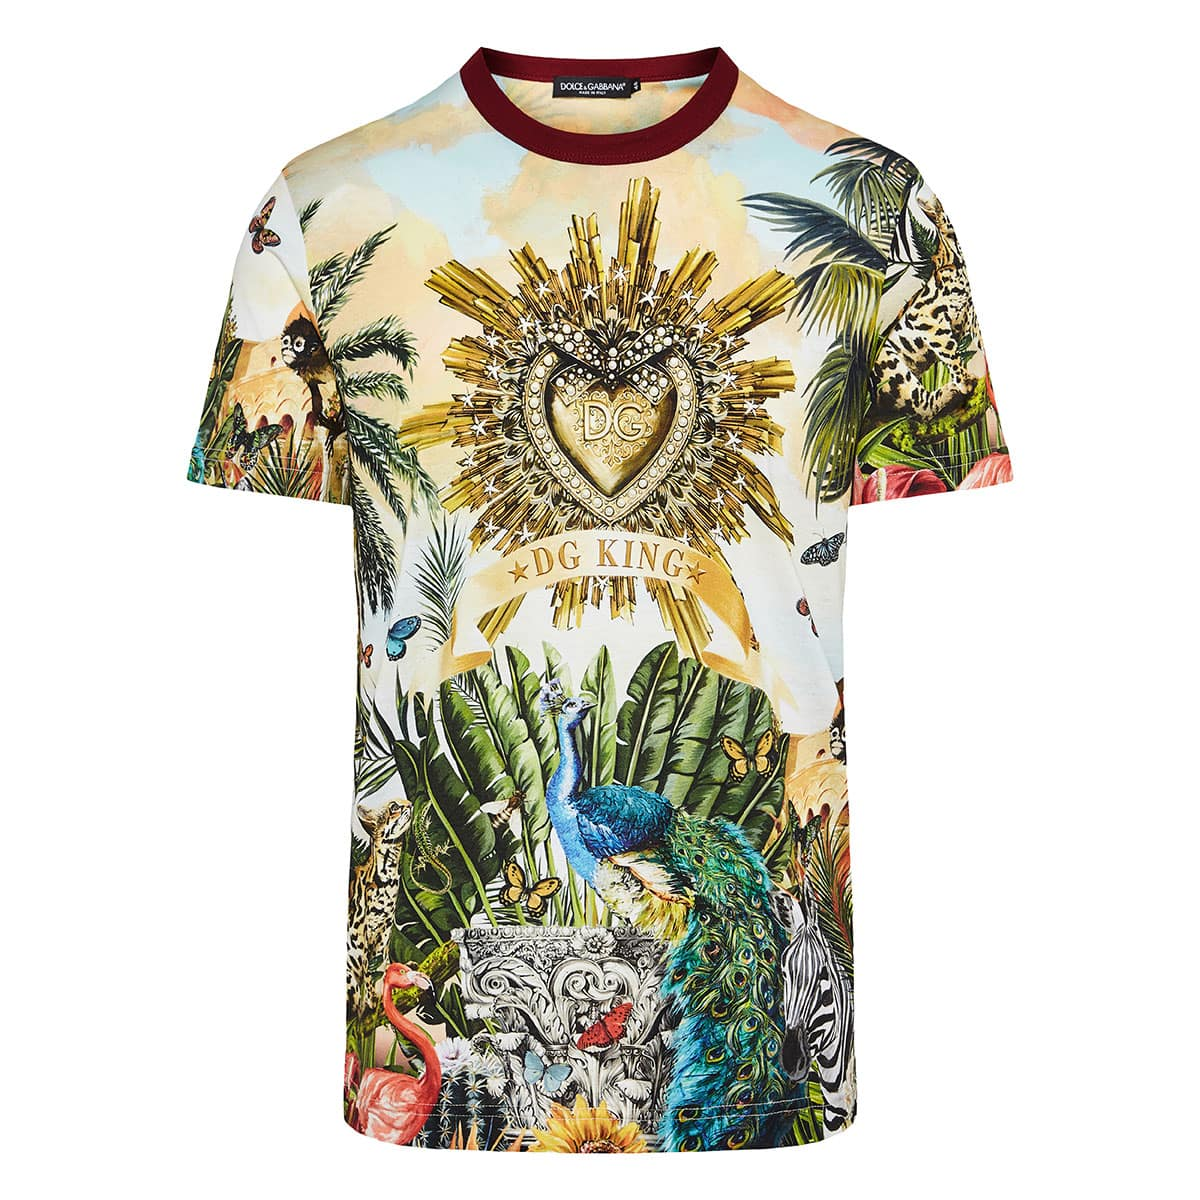 Tropical-printed cotton t-shirt